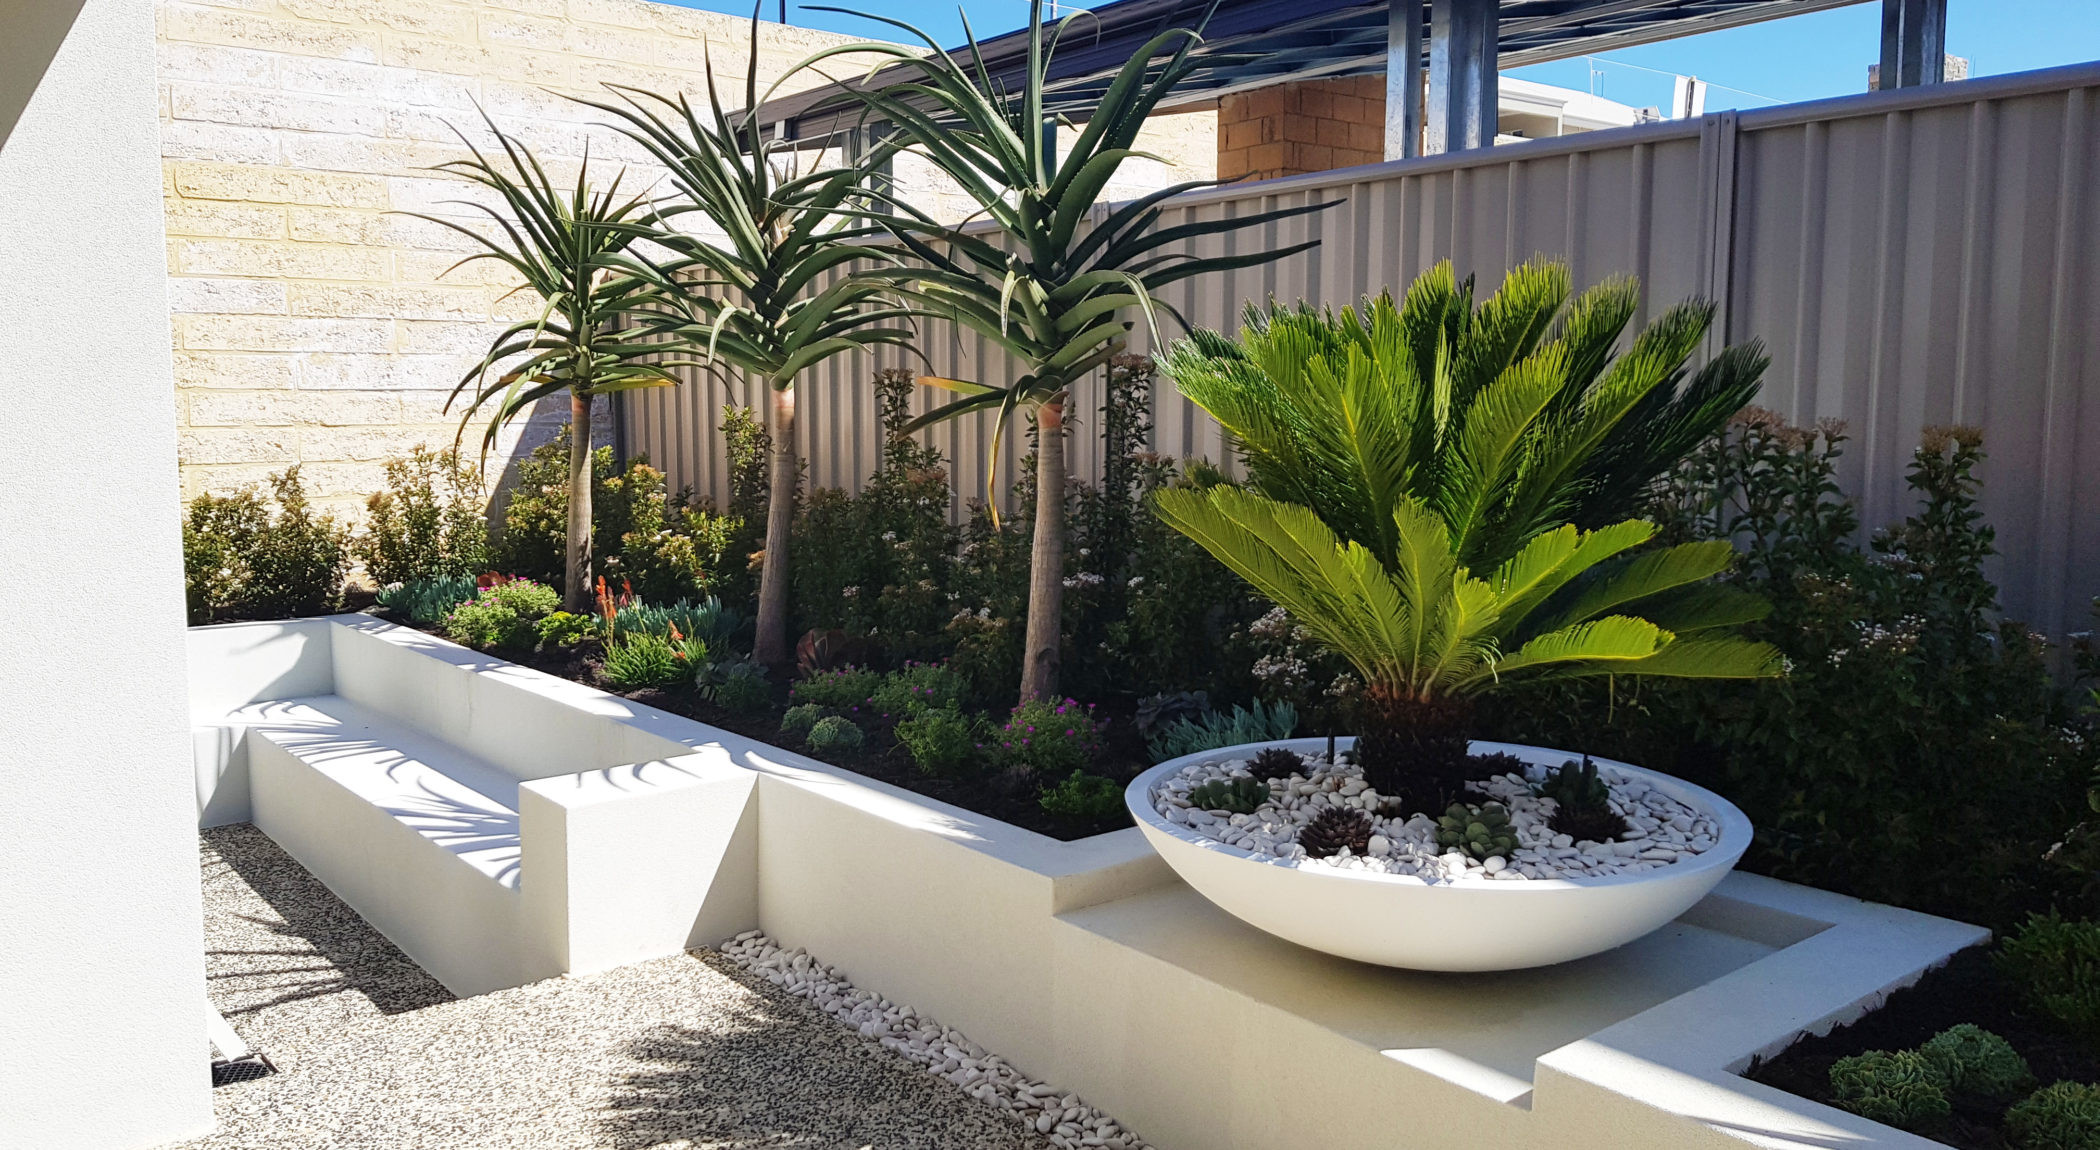 Landscape Design Perth  Landscaping Services Perth – Landscape Design